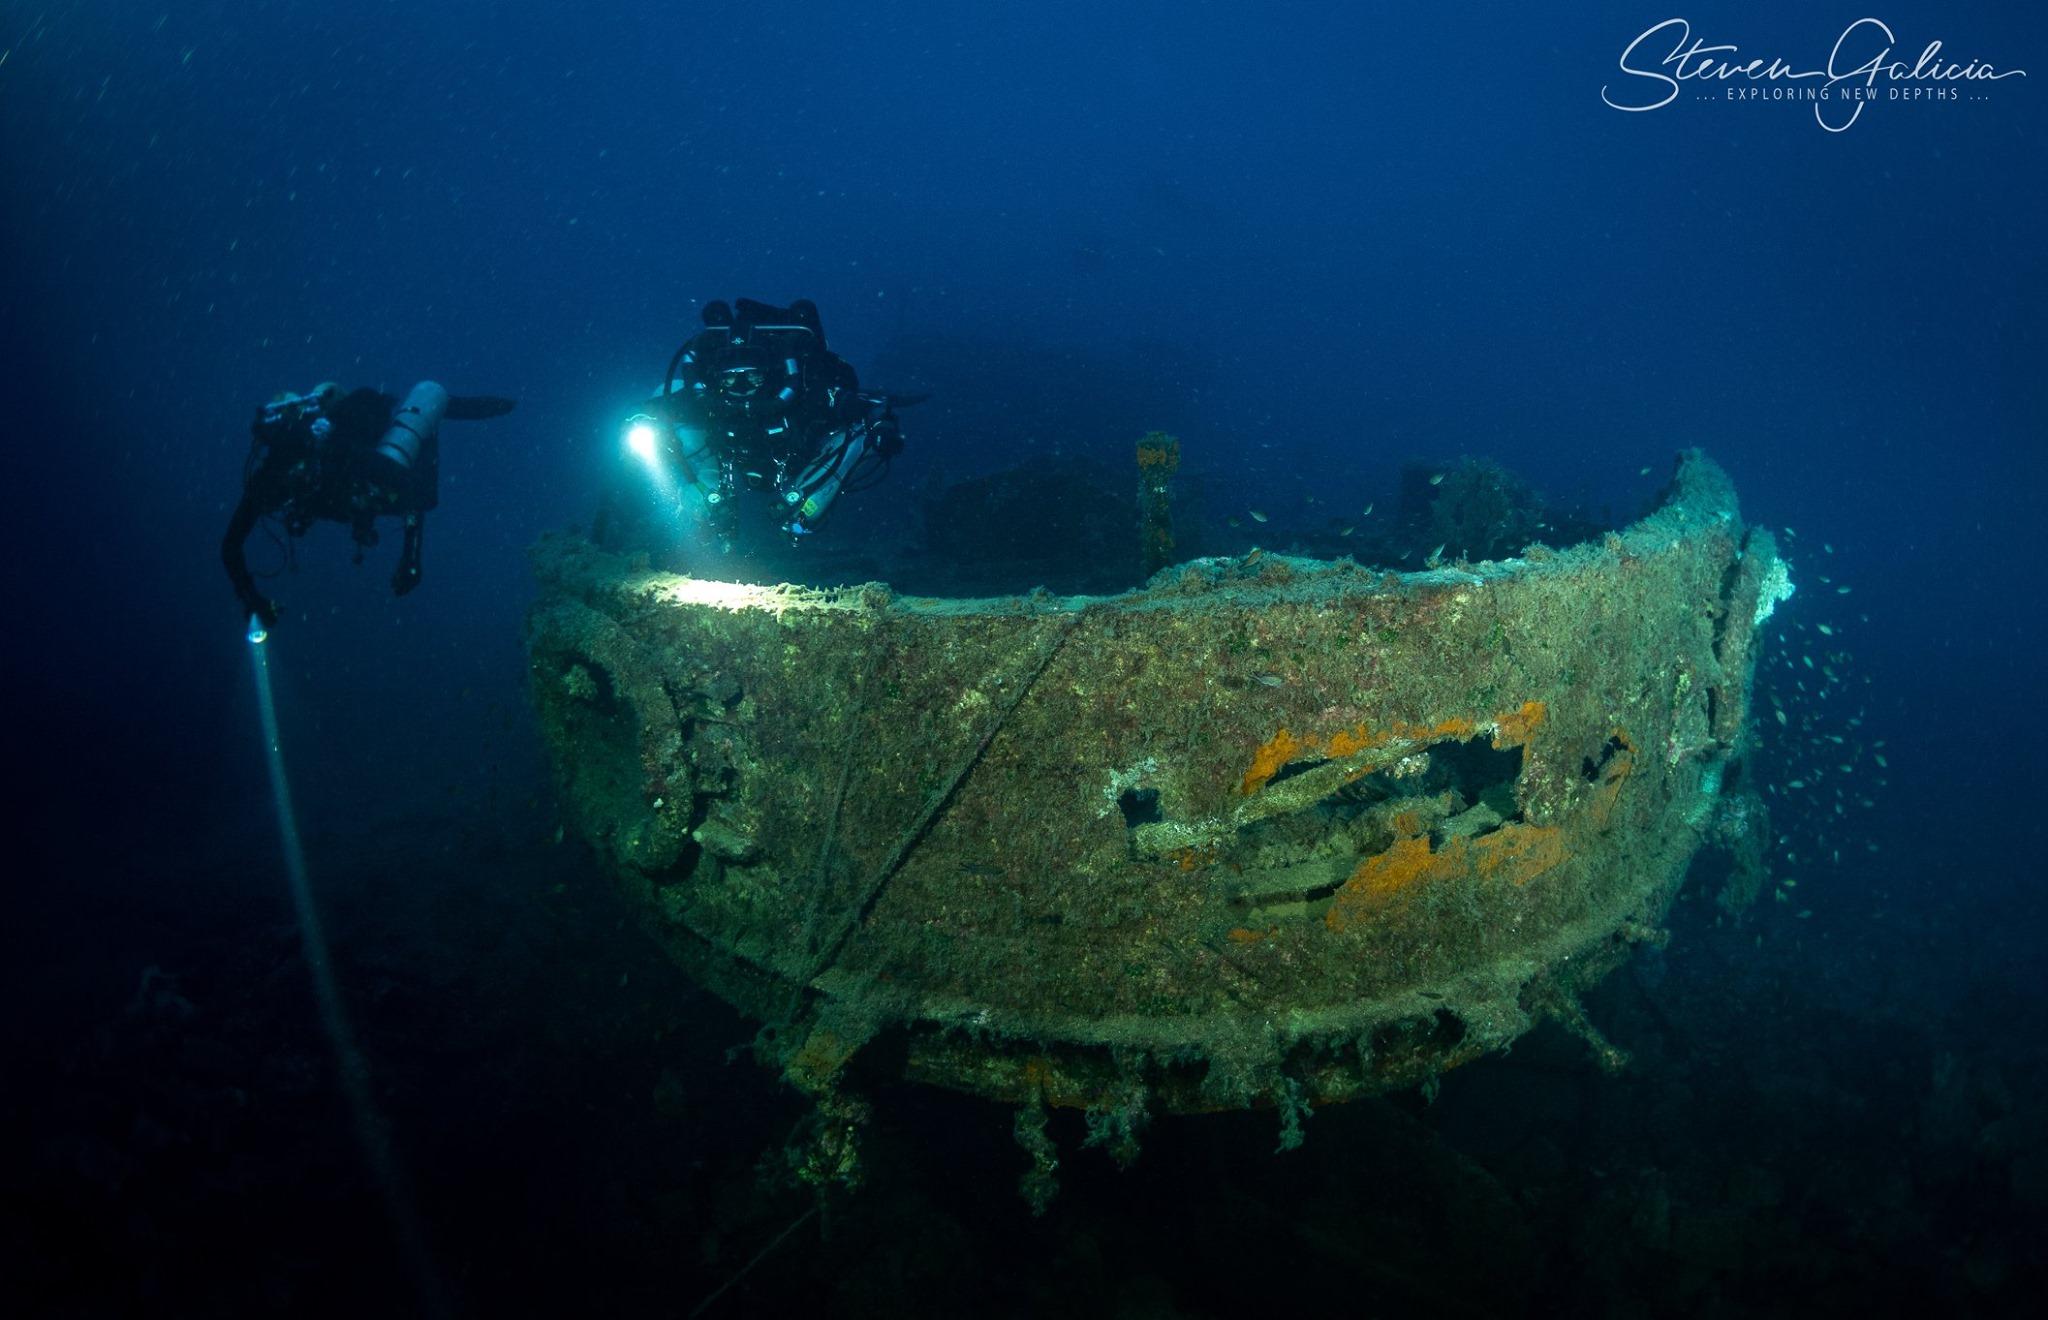 HMS Hellespont [Steven Galicia]